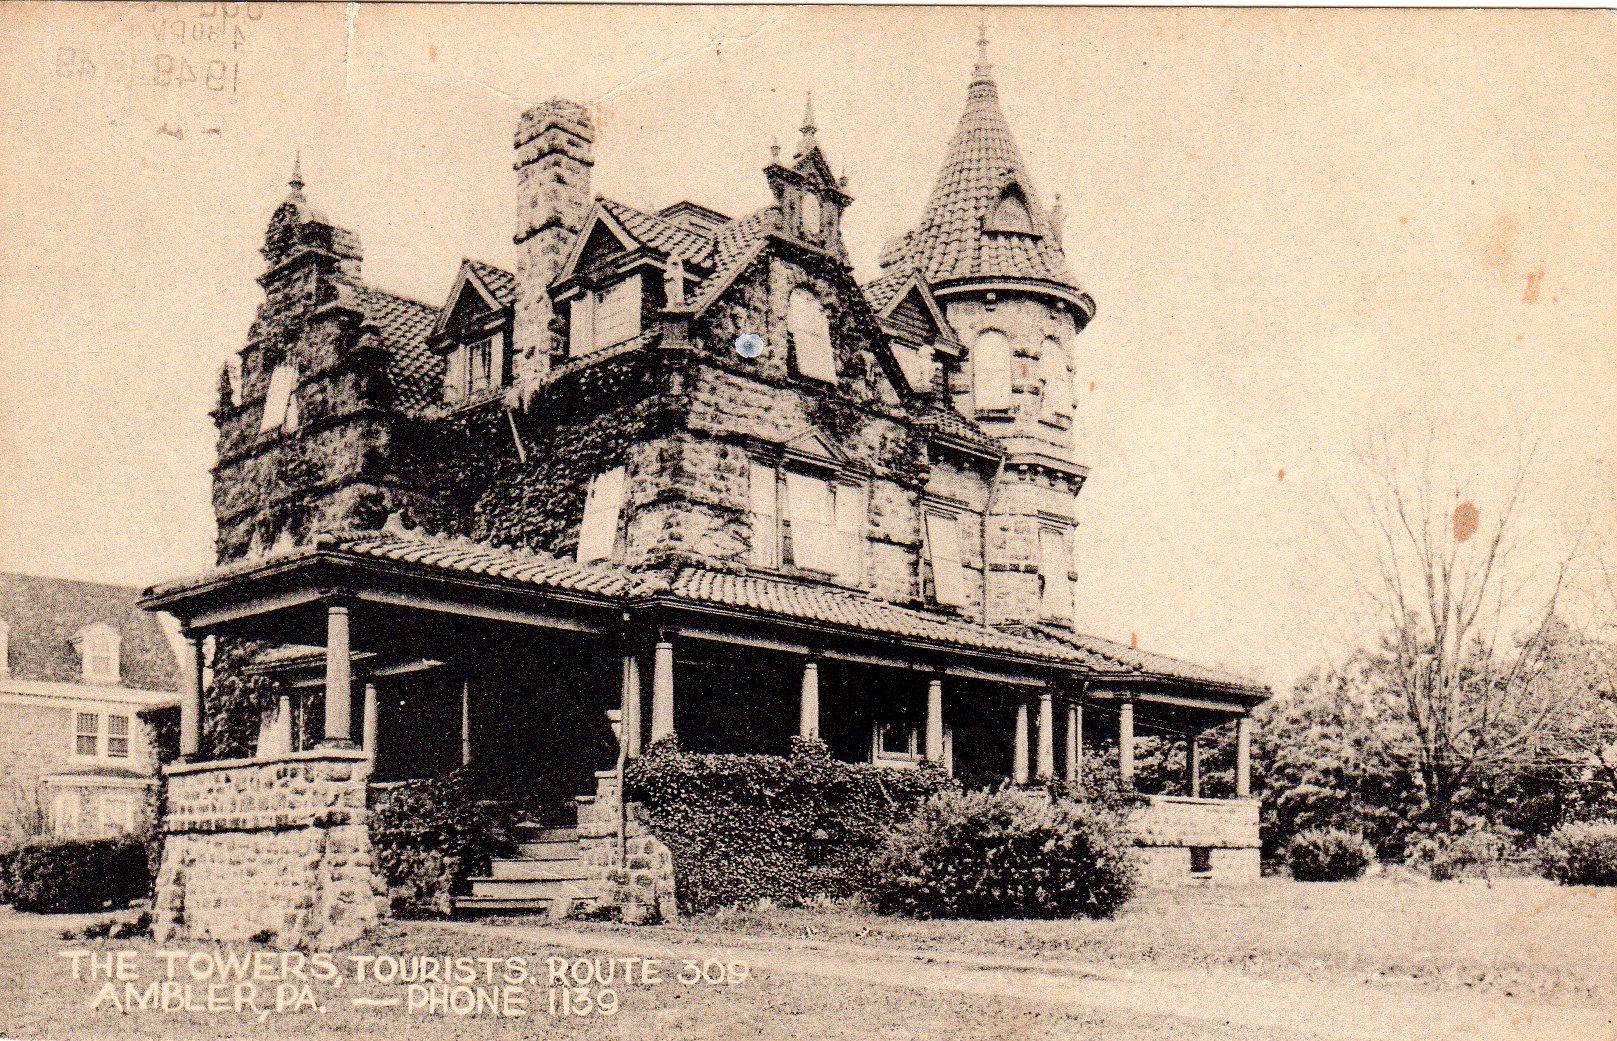 Post Card Collection (E Simon)_2682_37_The Towers (Tourist Rt 309), Ambler, Pa_21 Jul 1949